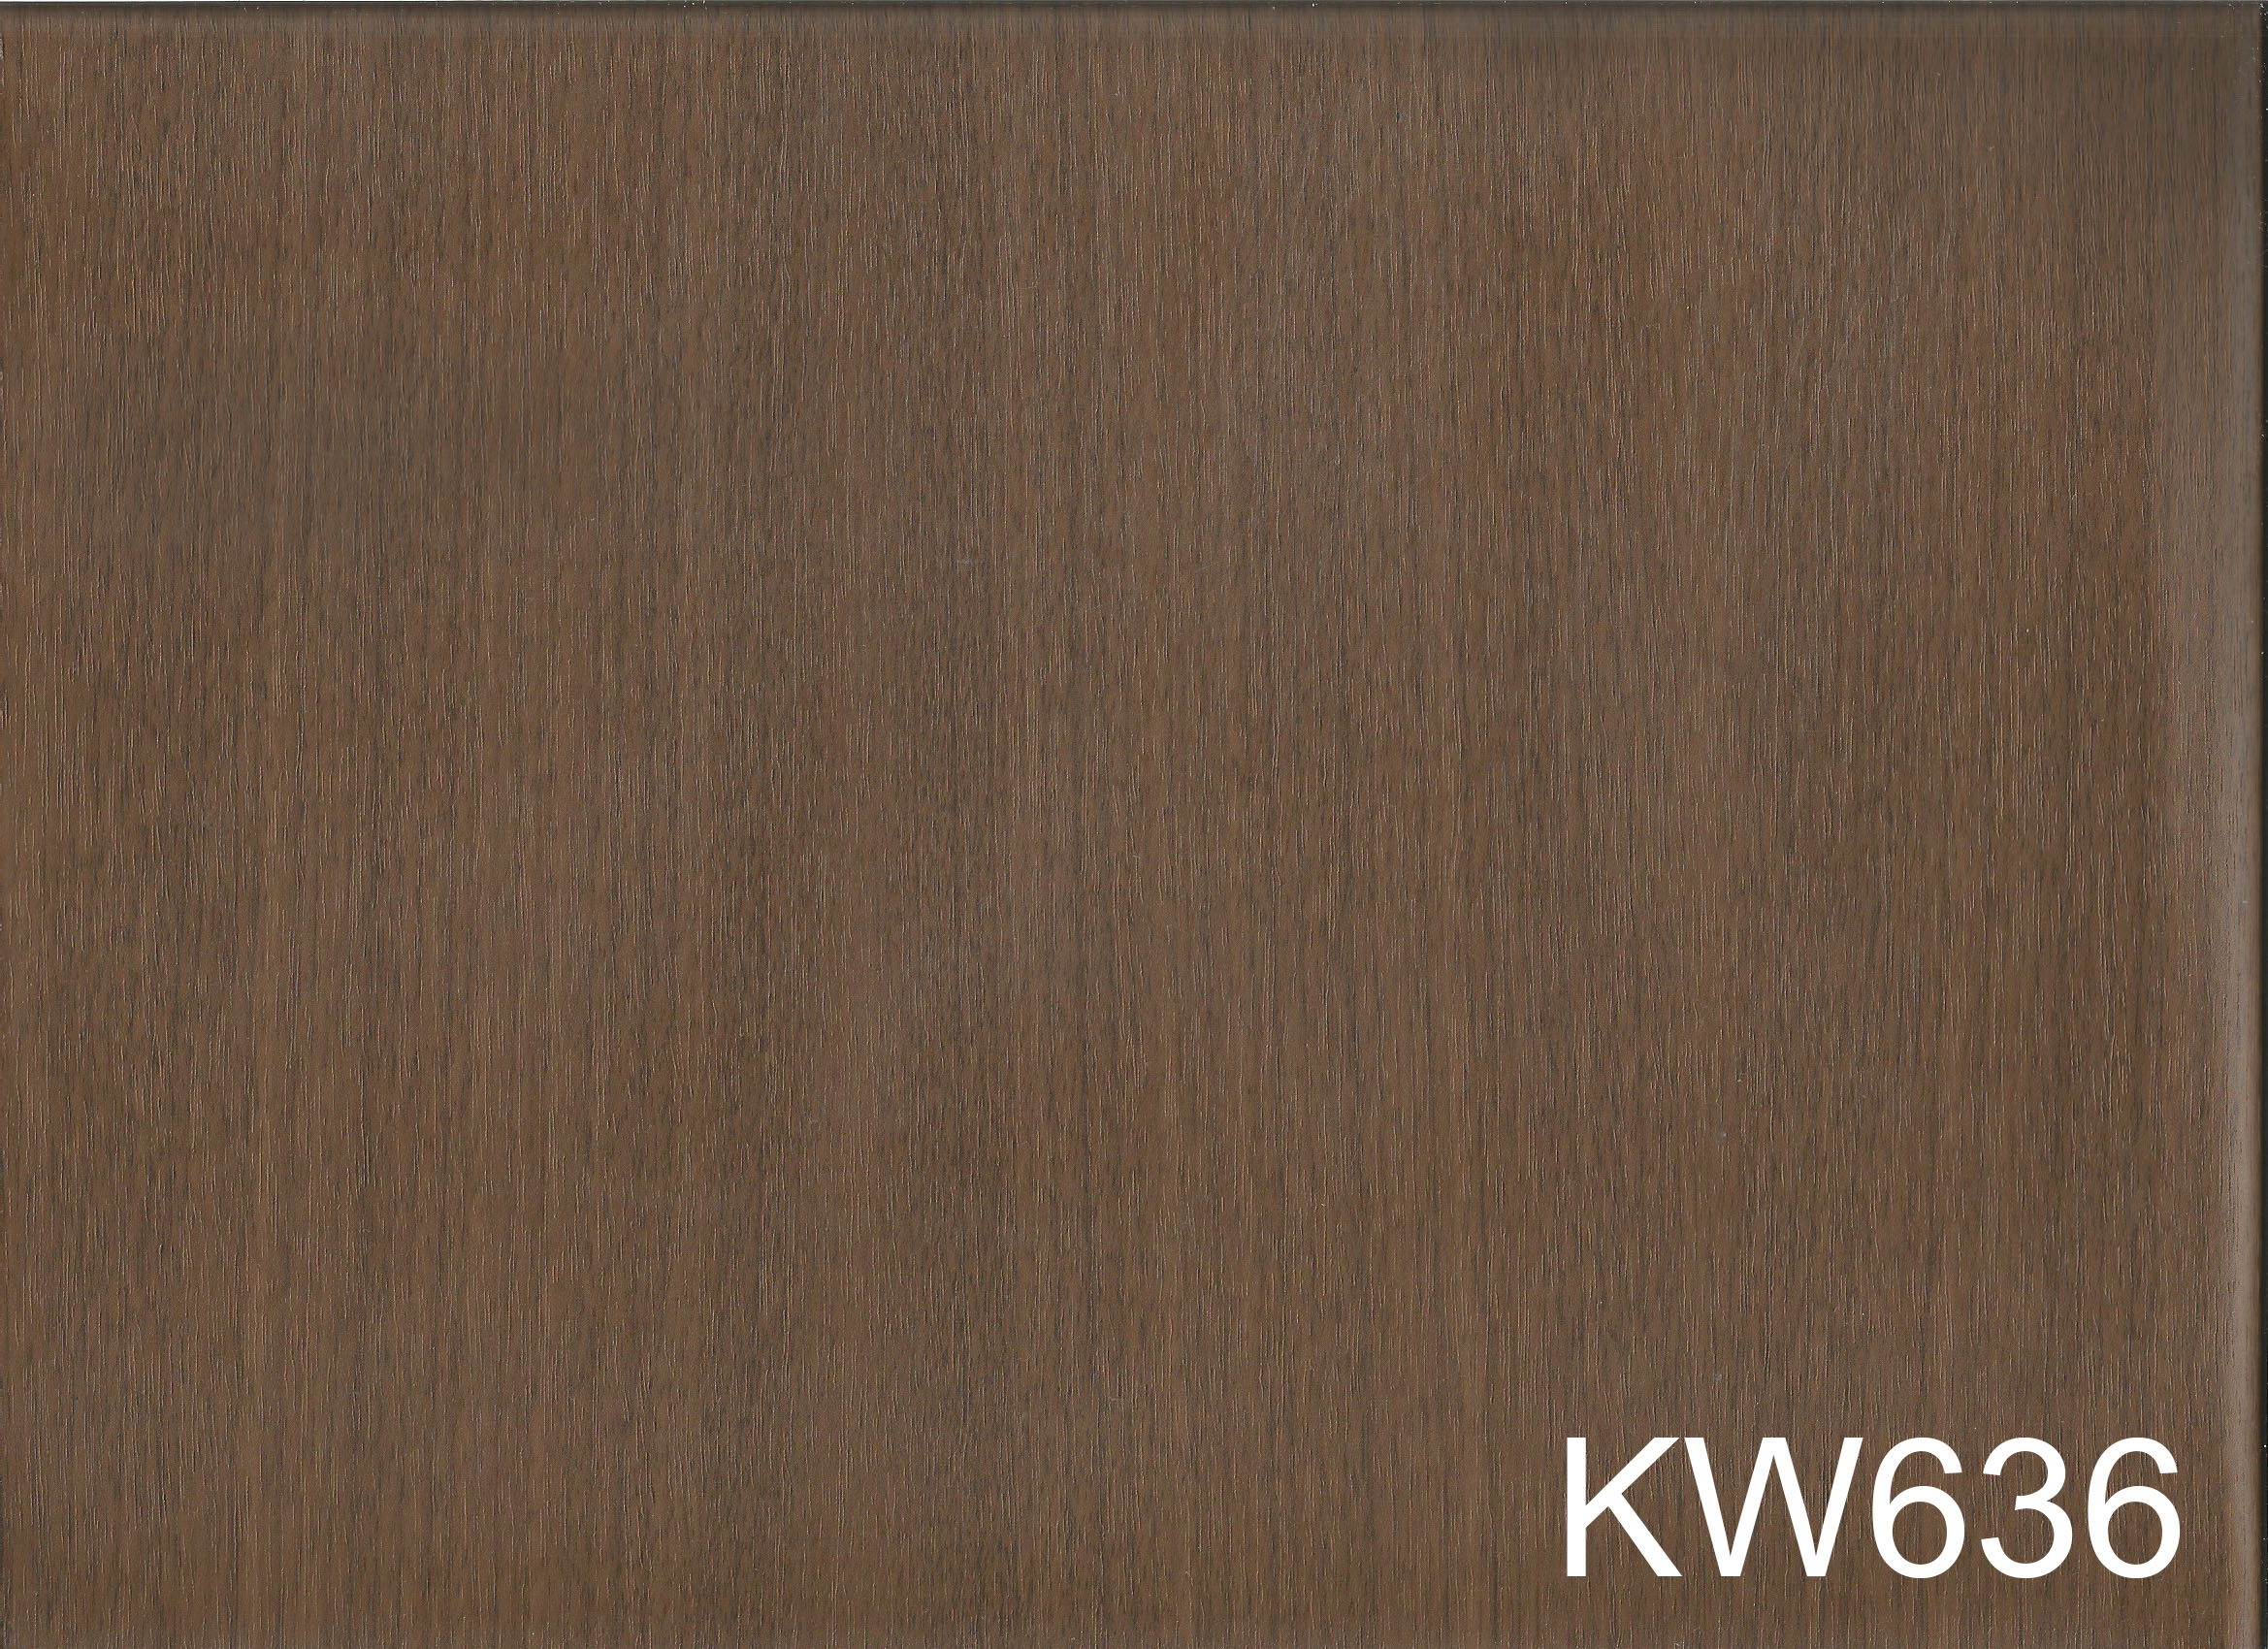 KW636